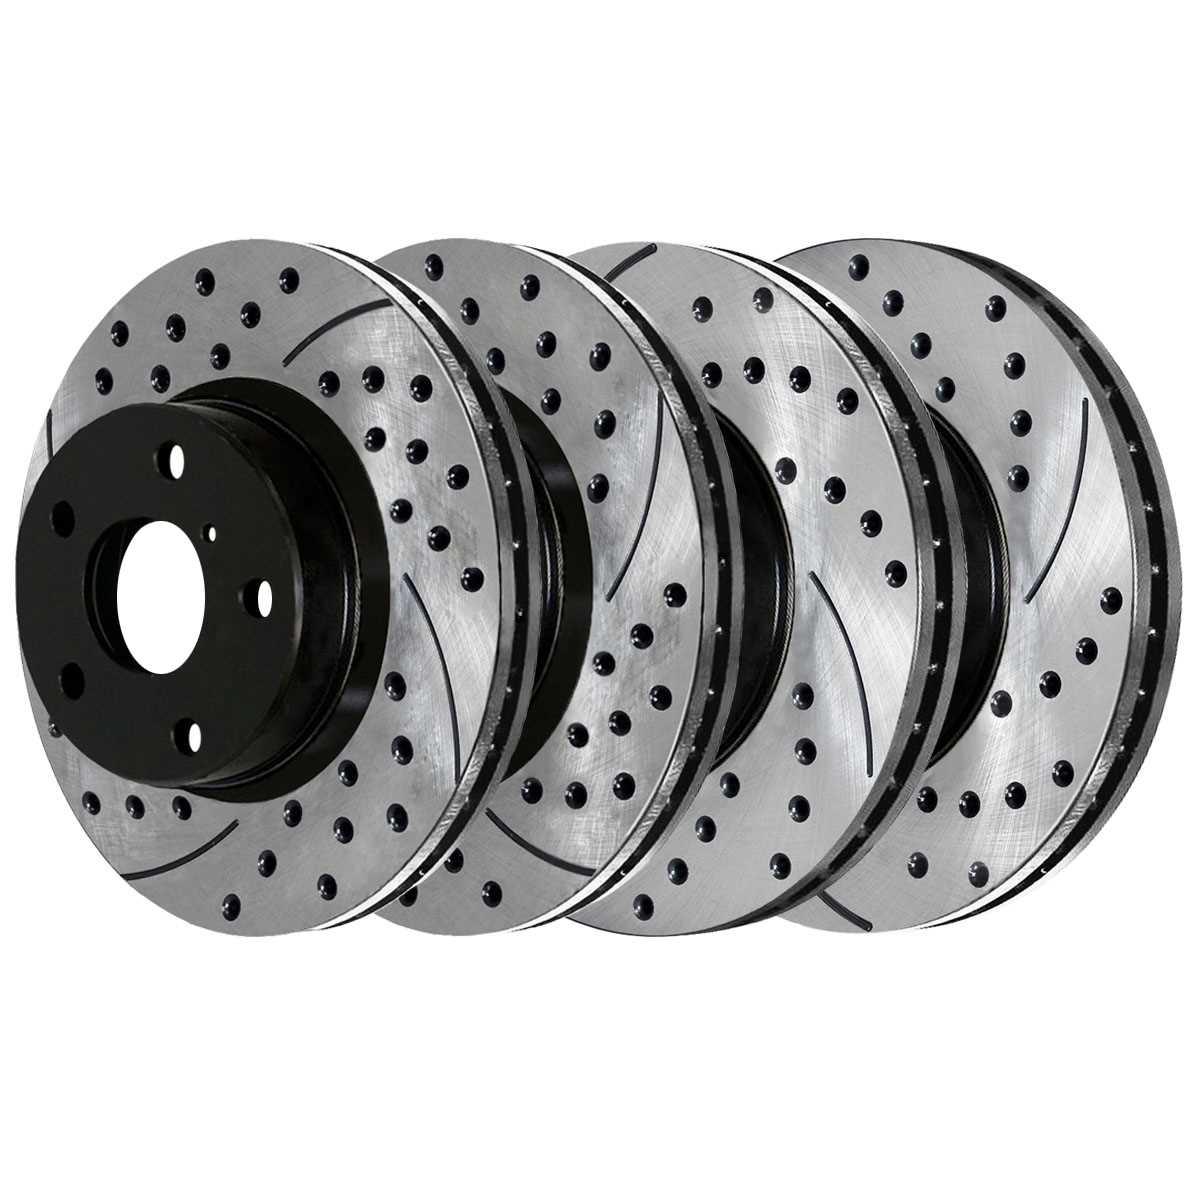 Prime Choice Auto Parts RSMK41272-41272-923-2-4 Set of 2 Premium Rotors /& 4 Semi Metallic Pads